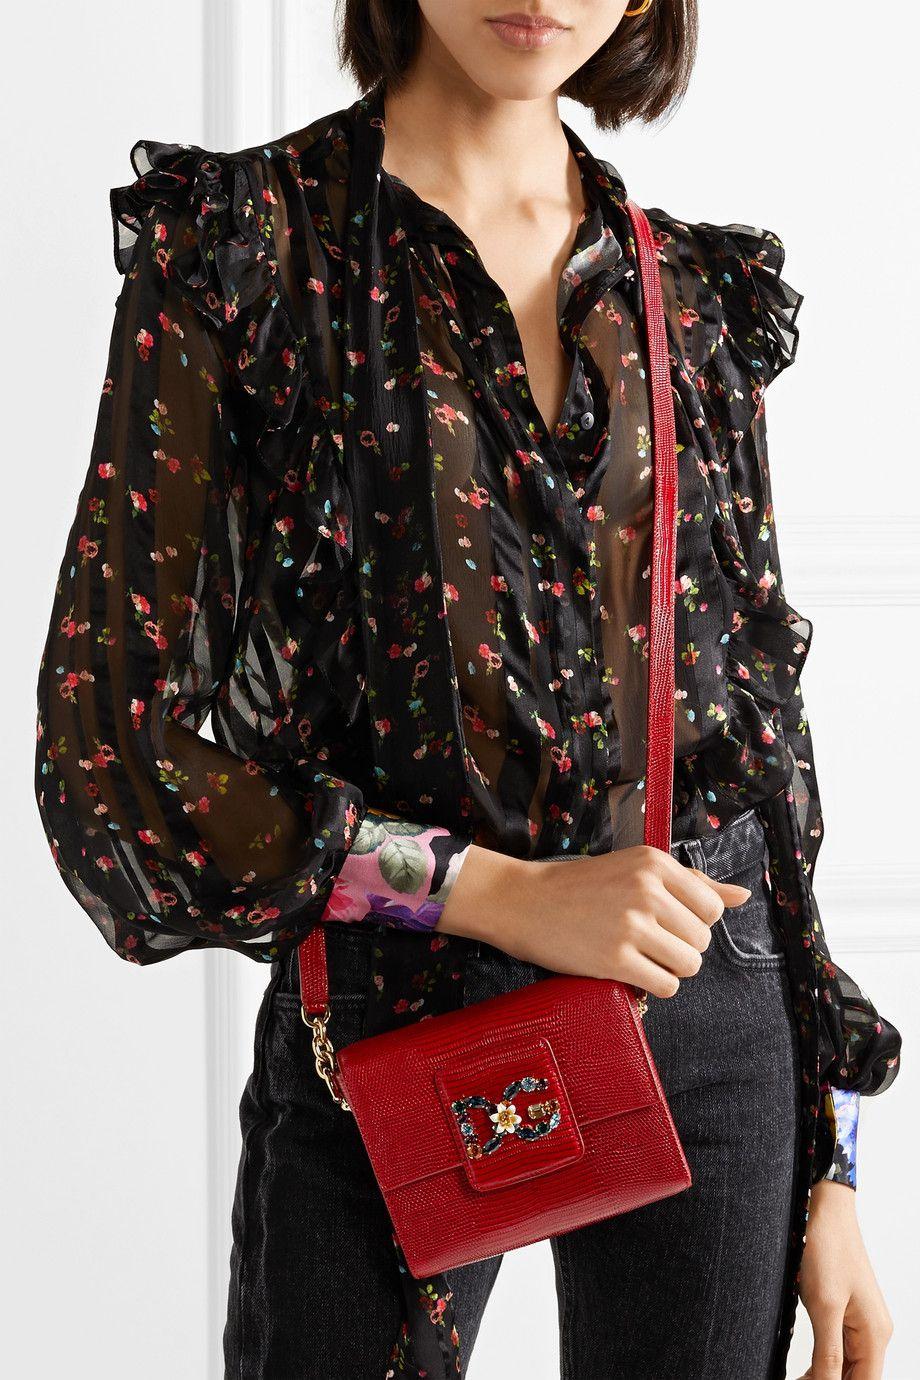 Blagdansko raspoloženje preselilo se na torbice: Najljepši crveni modeli